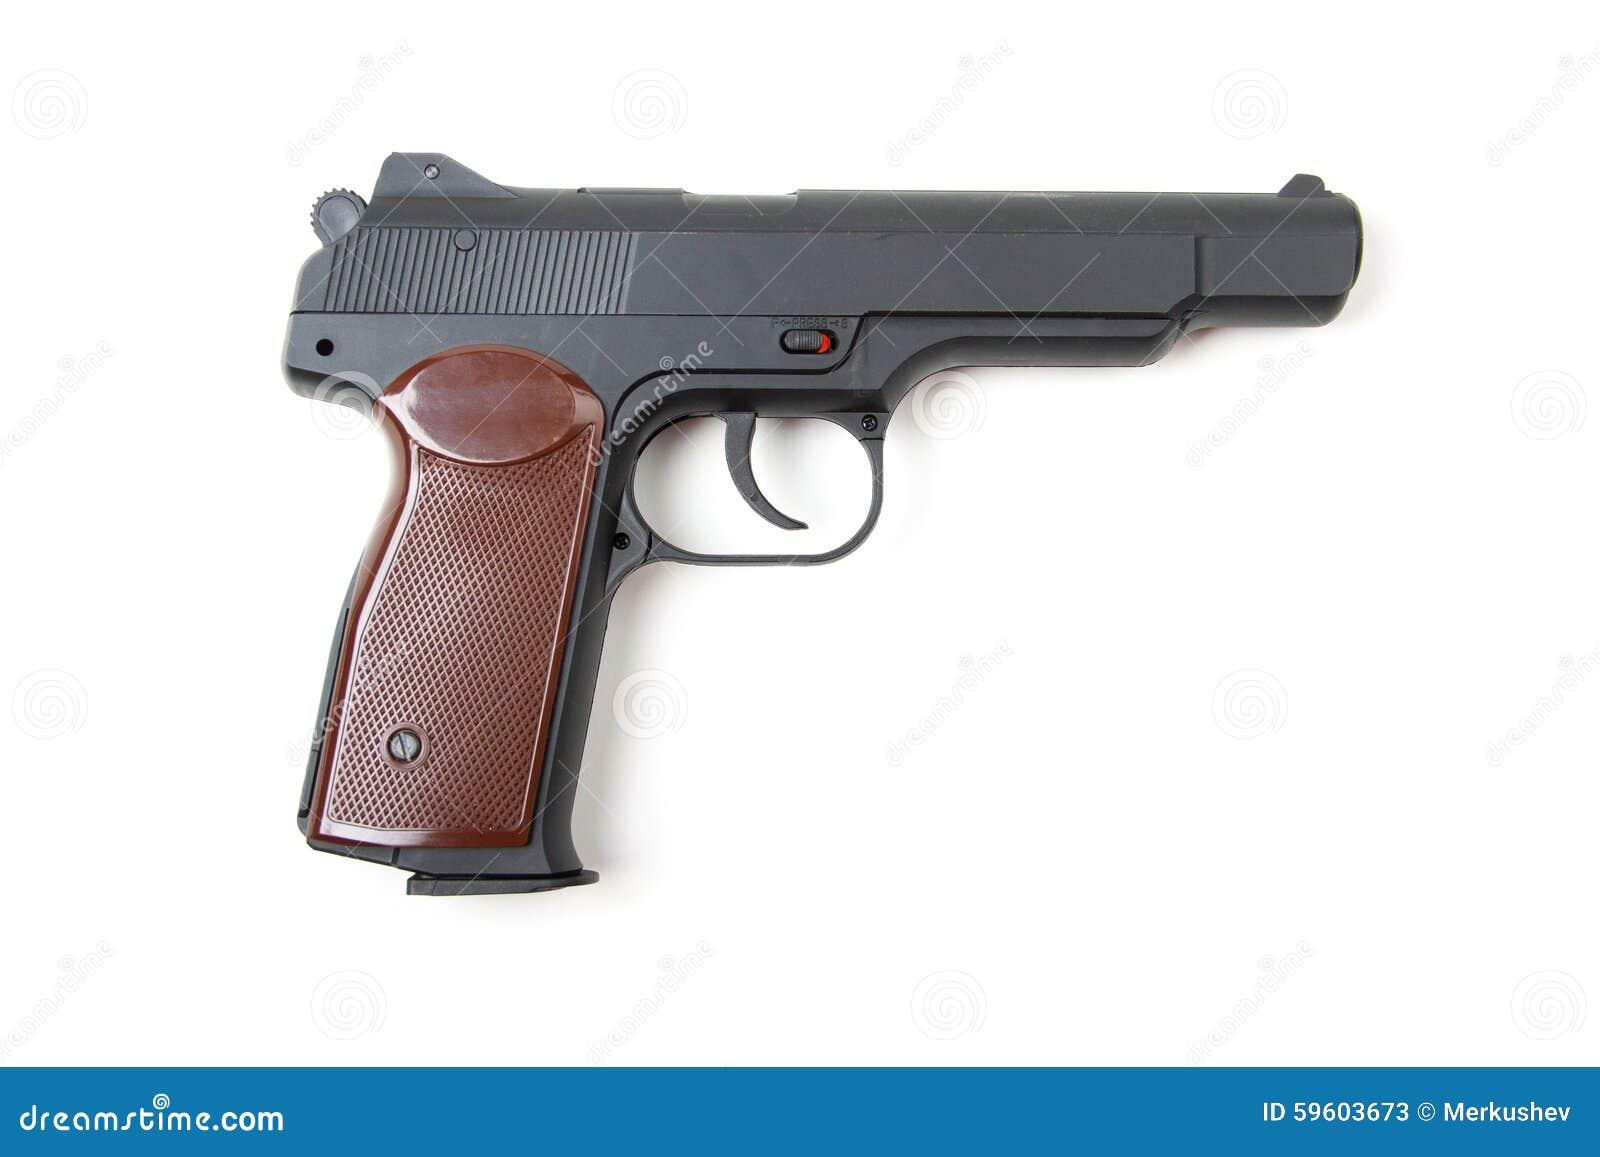 gun white background - photo #30